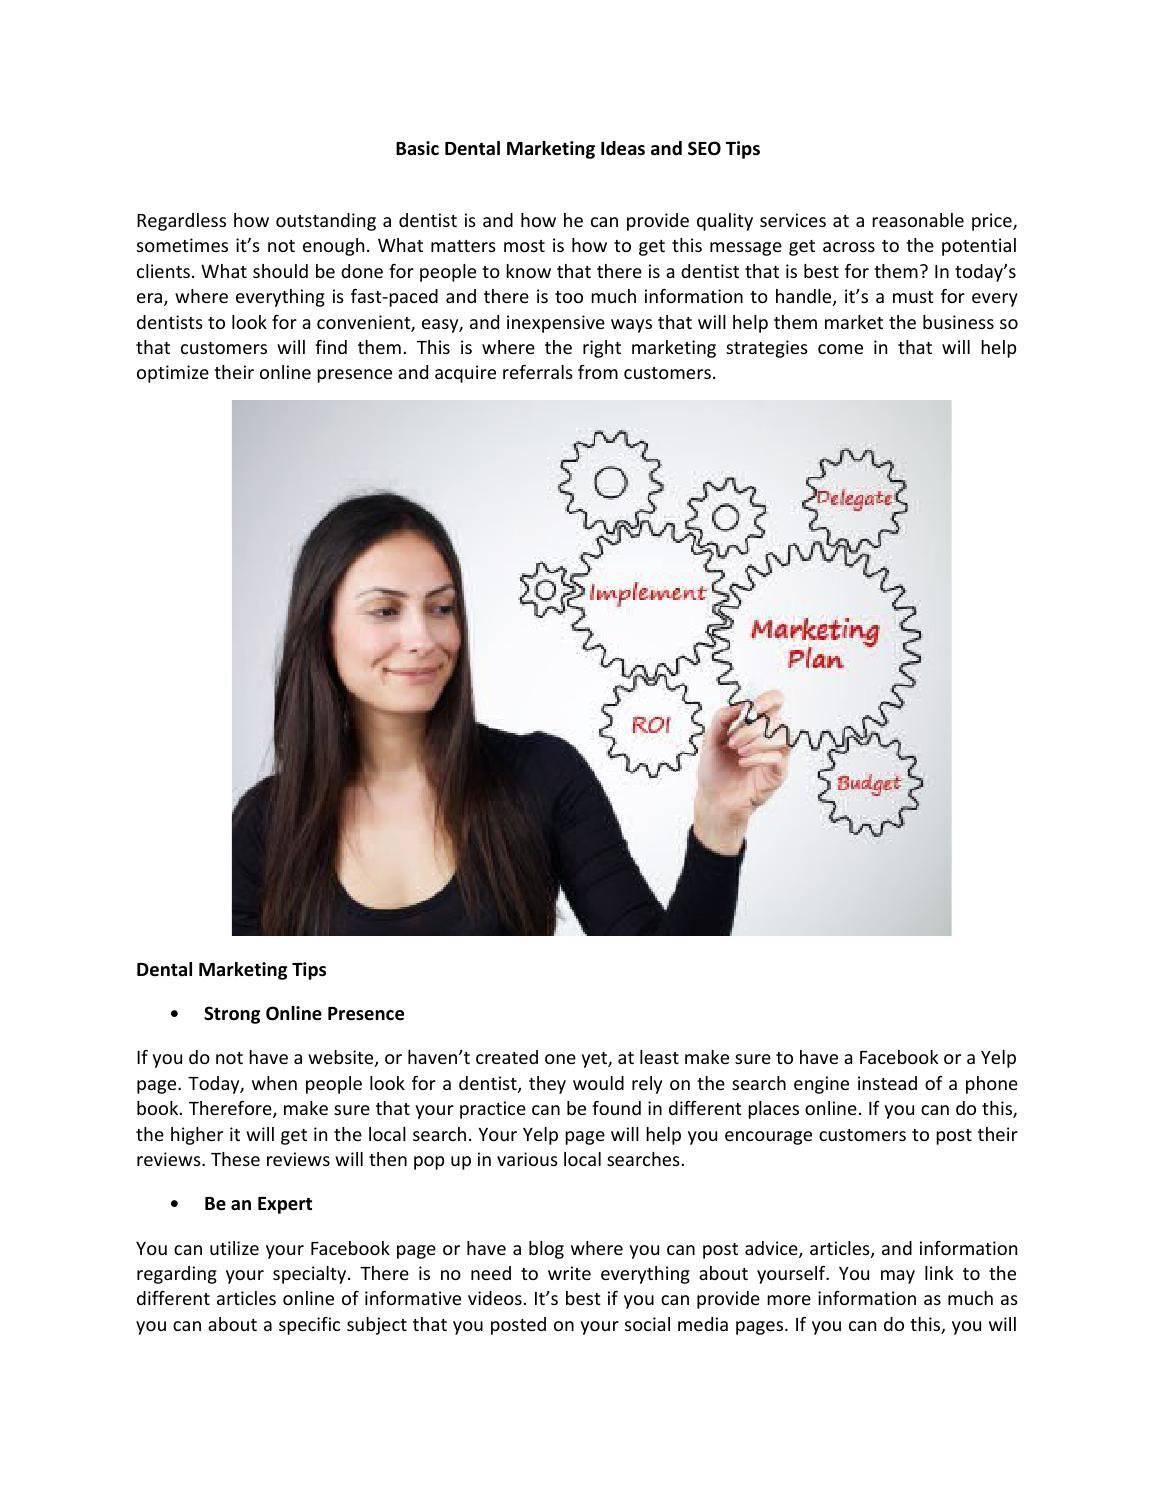 Basic dental marketing ideas and seo tips by GraceBryant - issuu